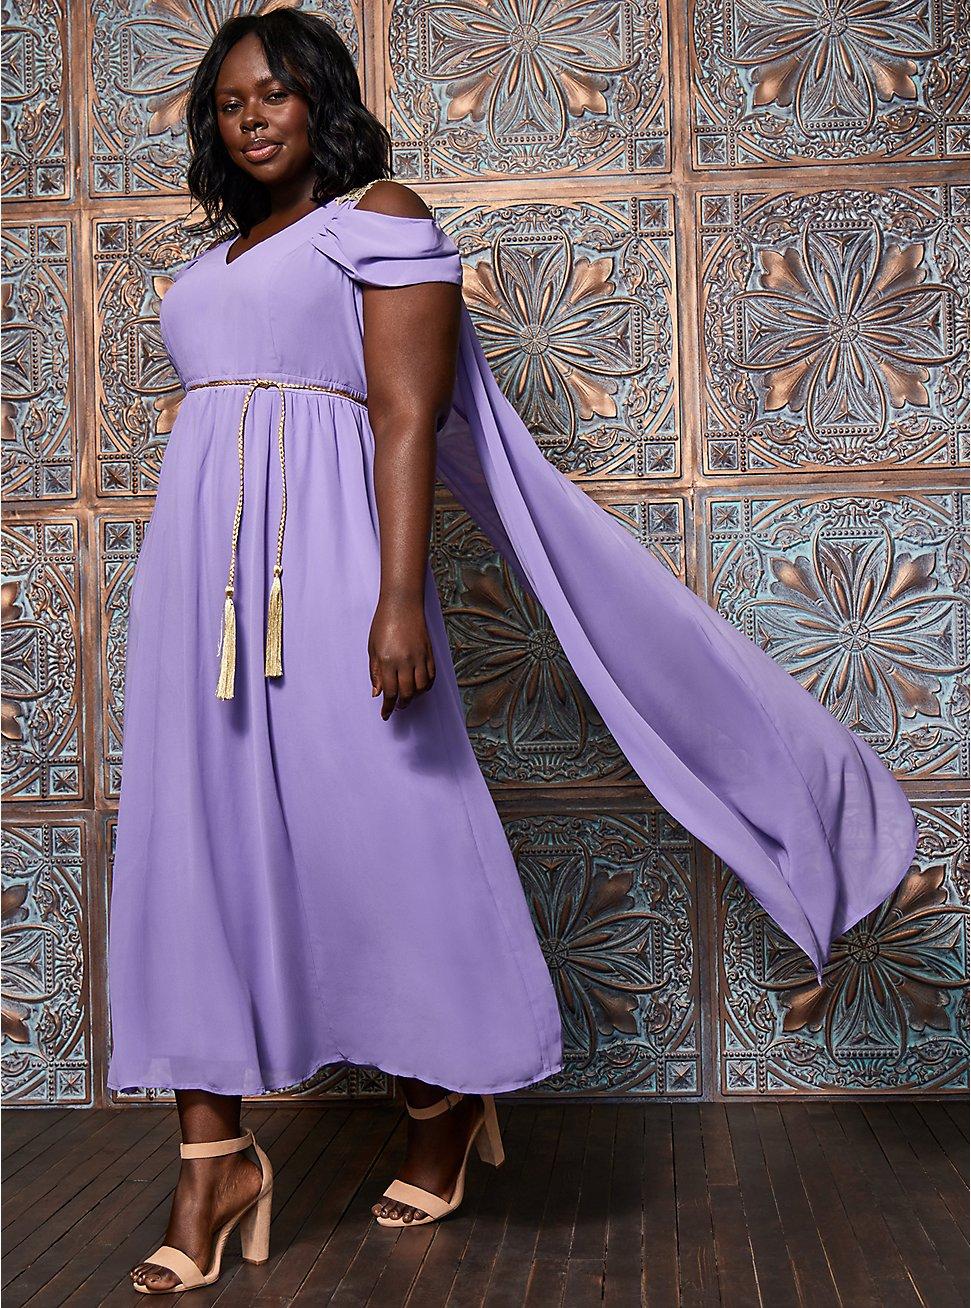 Goddess Queen Caped Costume, PURPLE, hi-res